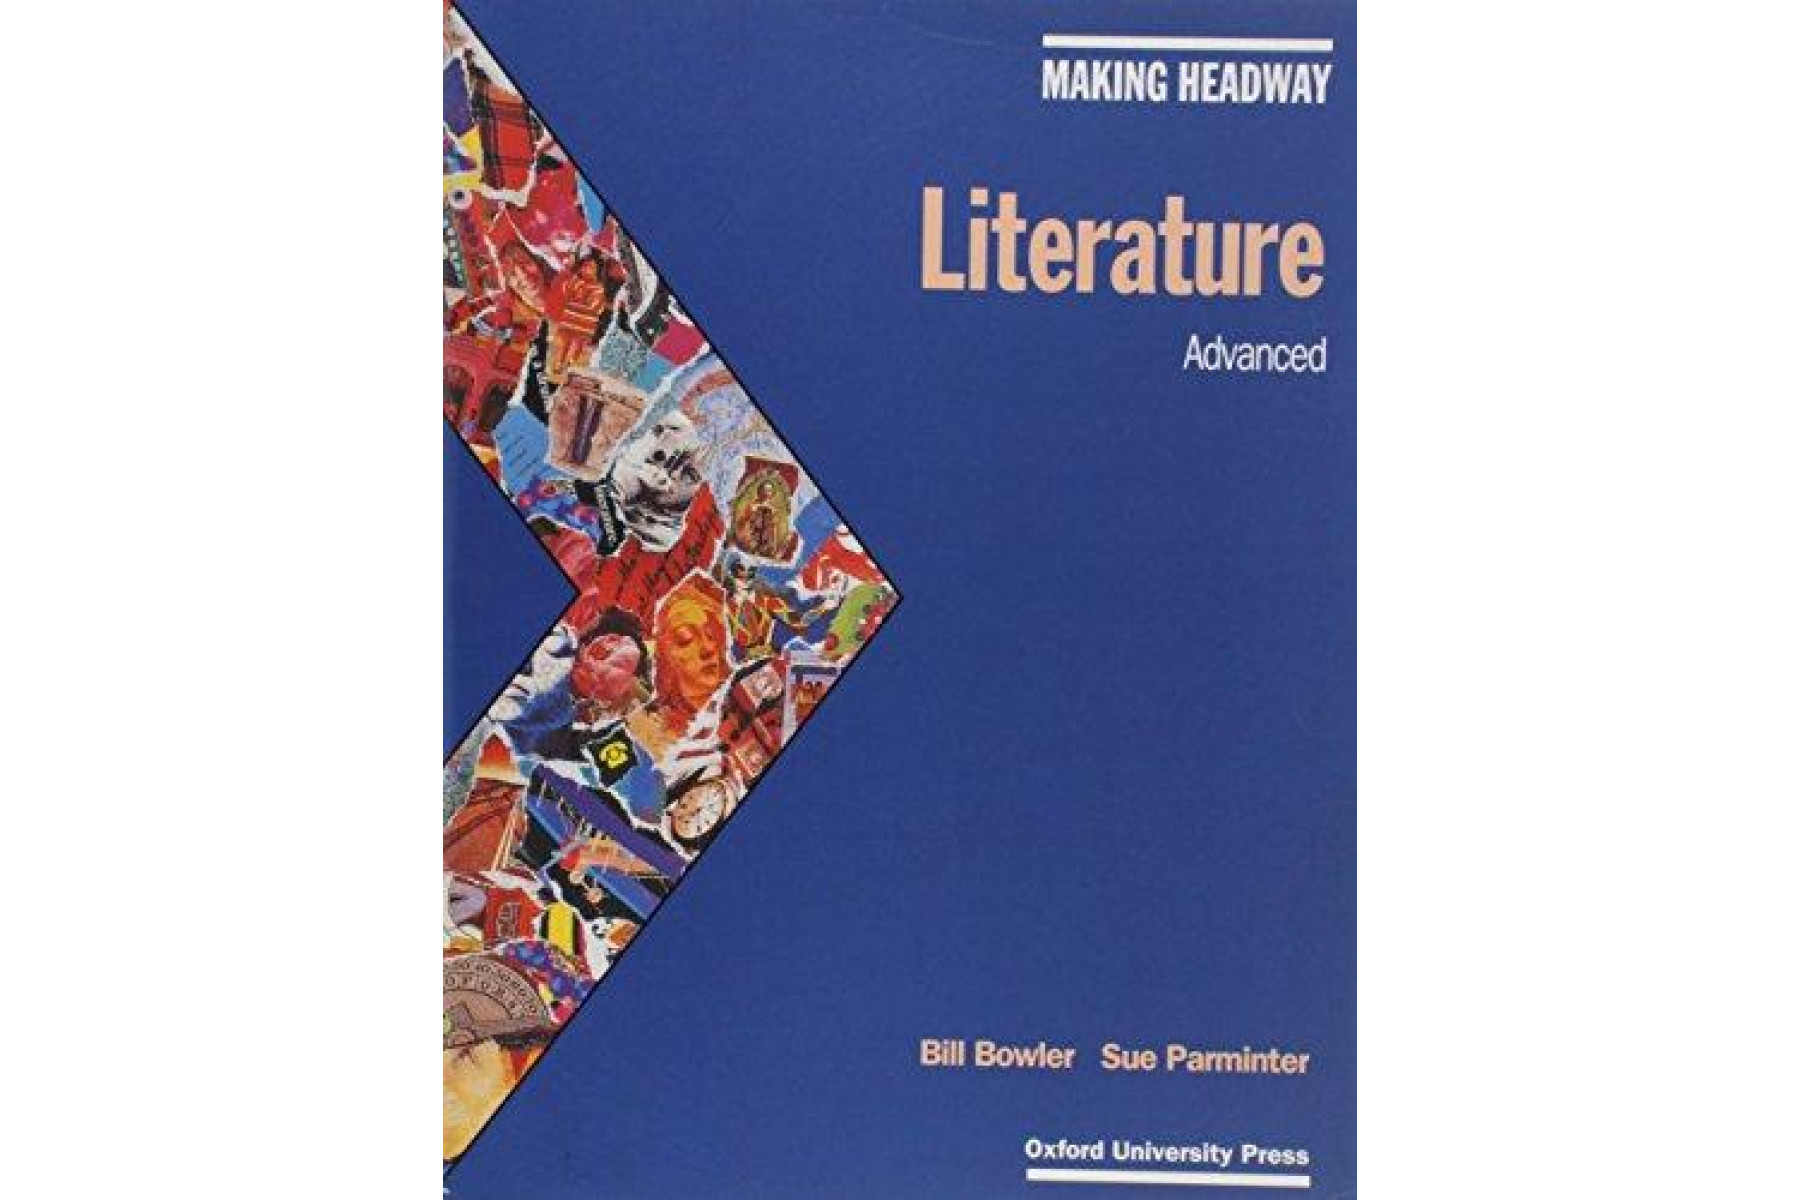 Making Headway: Literature Advanced